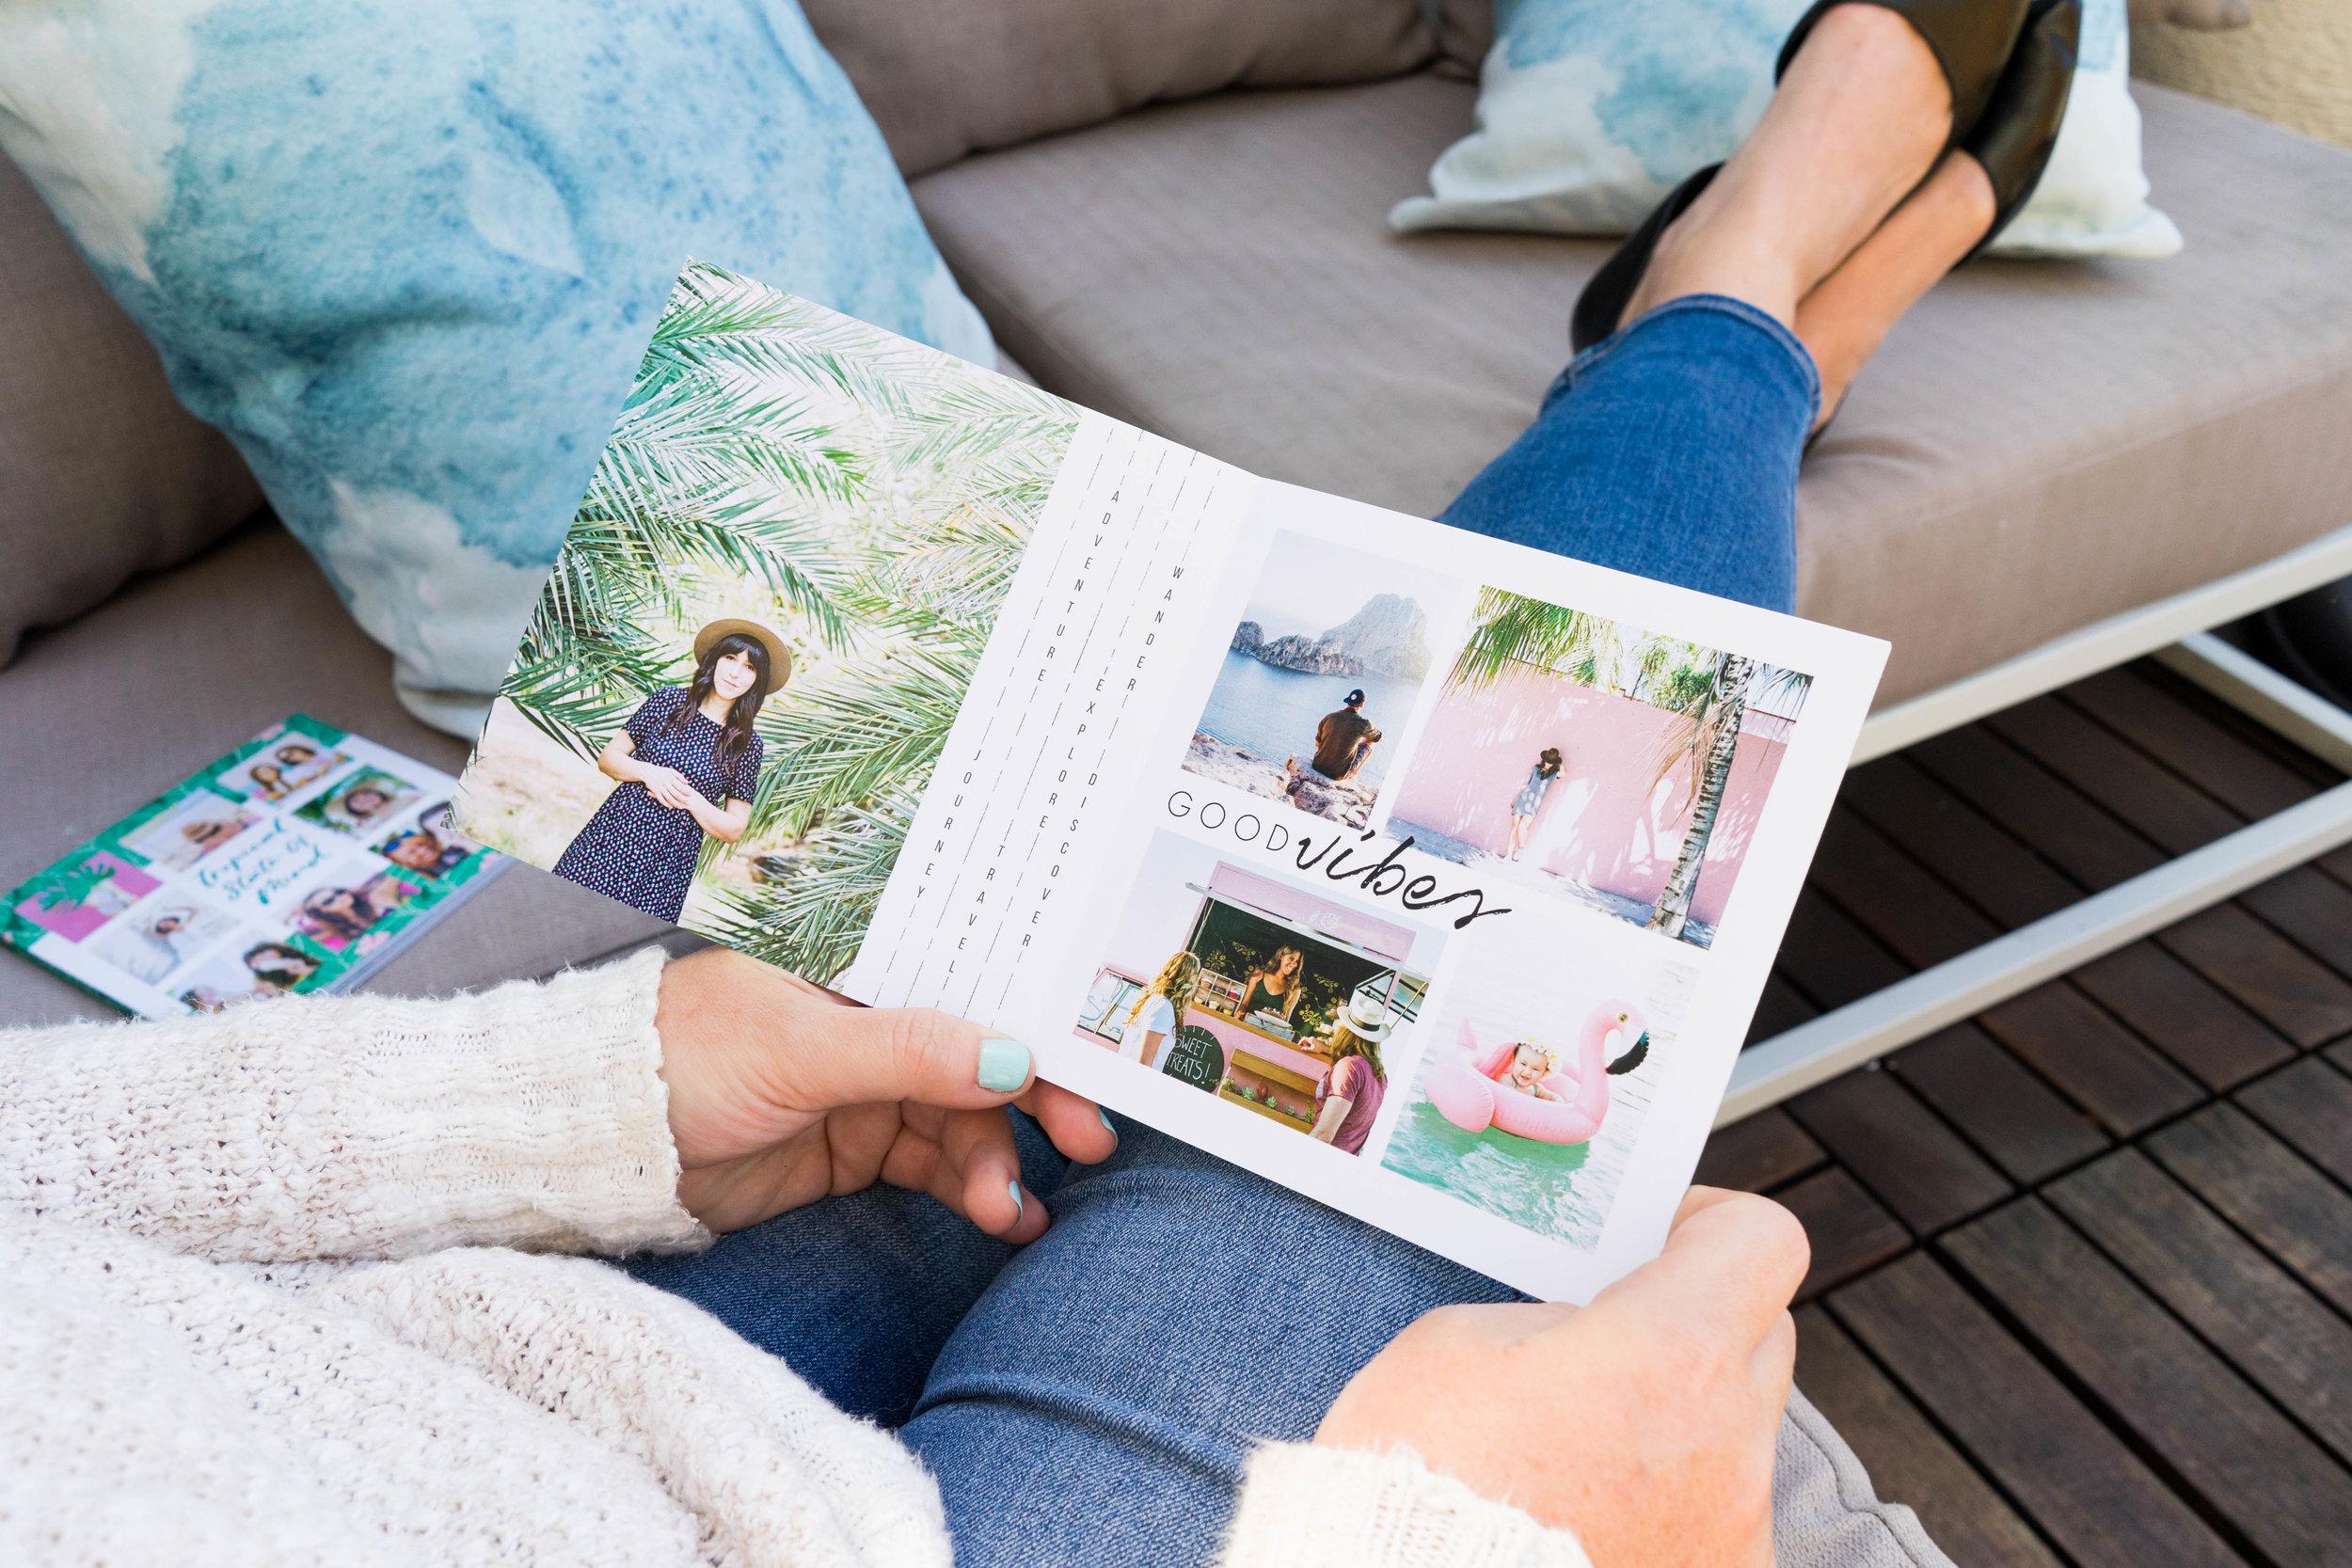 modern-travel-photo-book-vacation.jpg